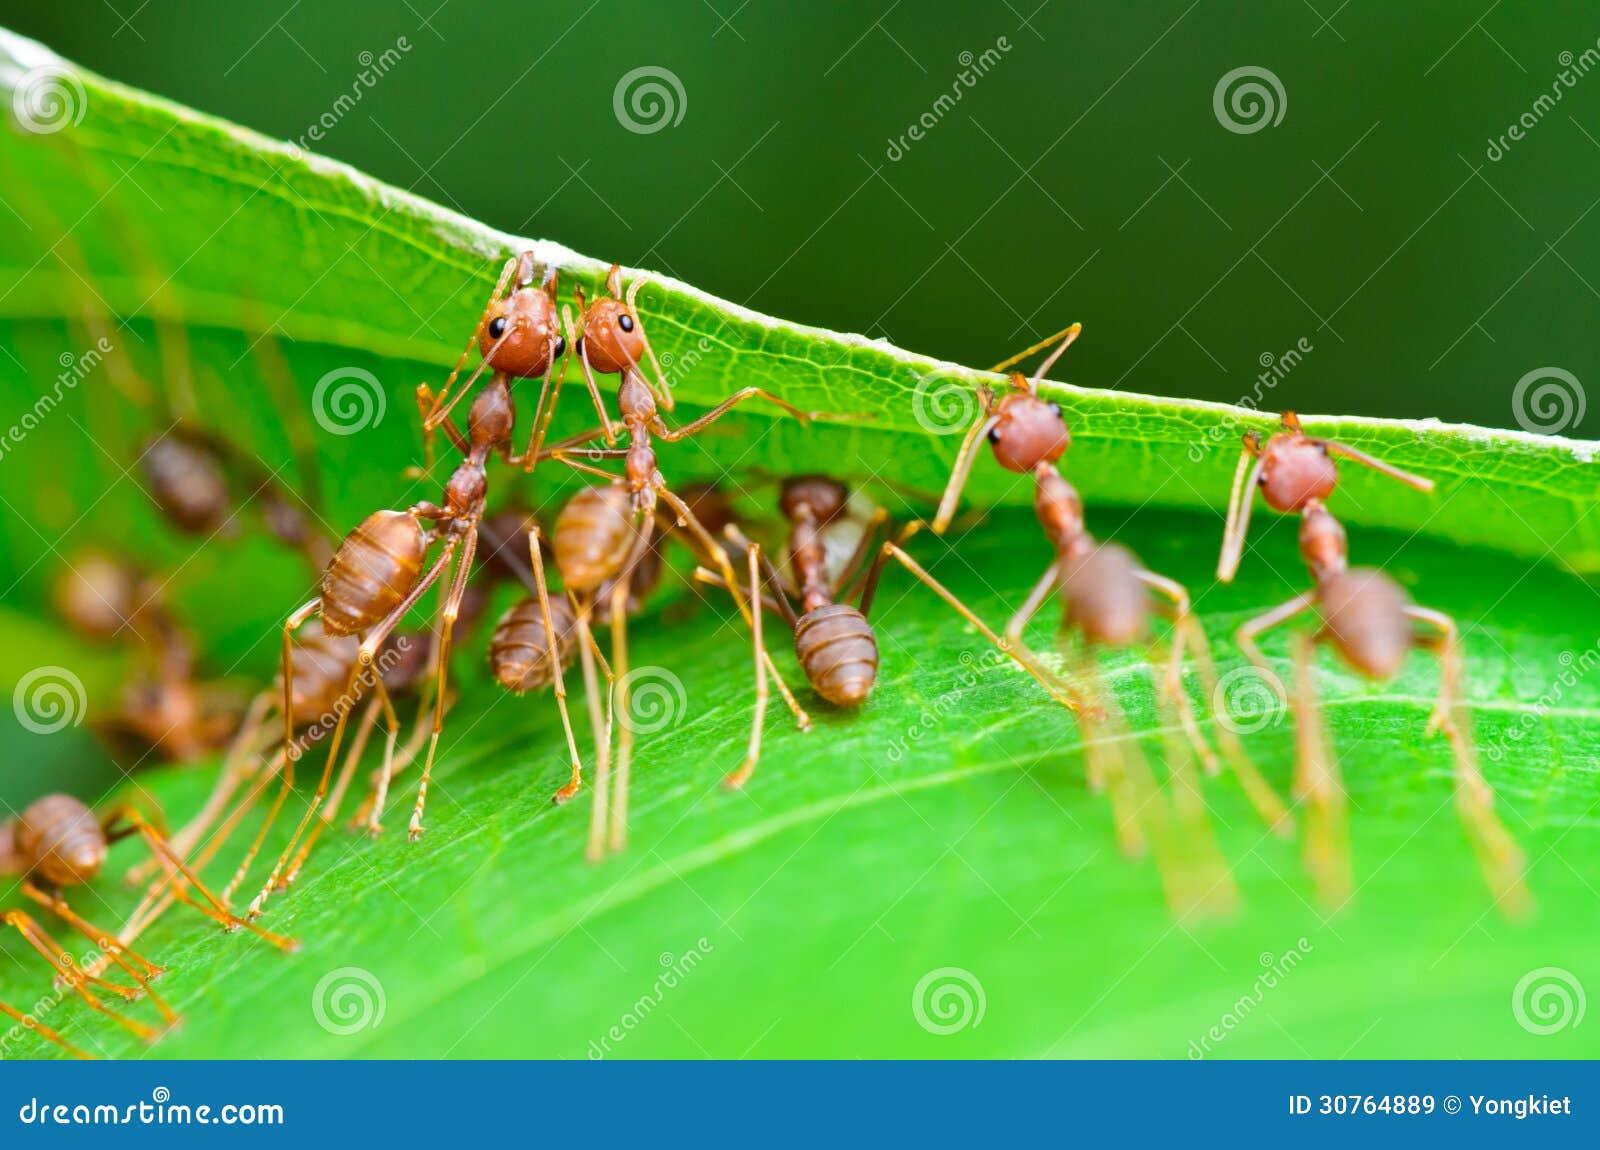 Oecophylla smaragdina (gemensamma namn inkluderar Weaver Ant,